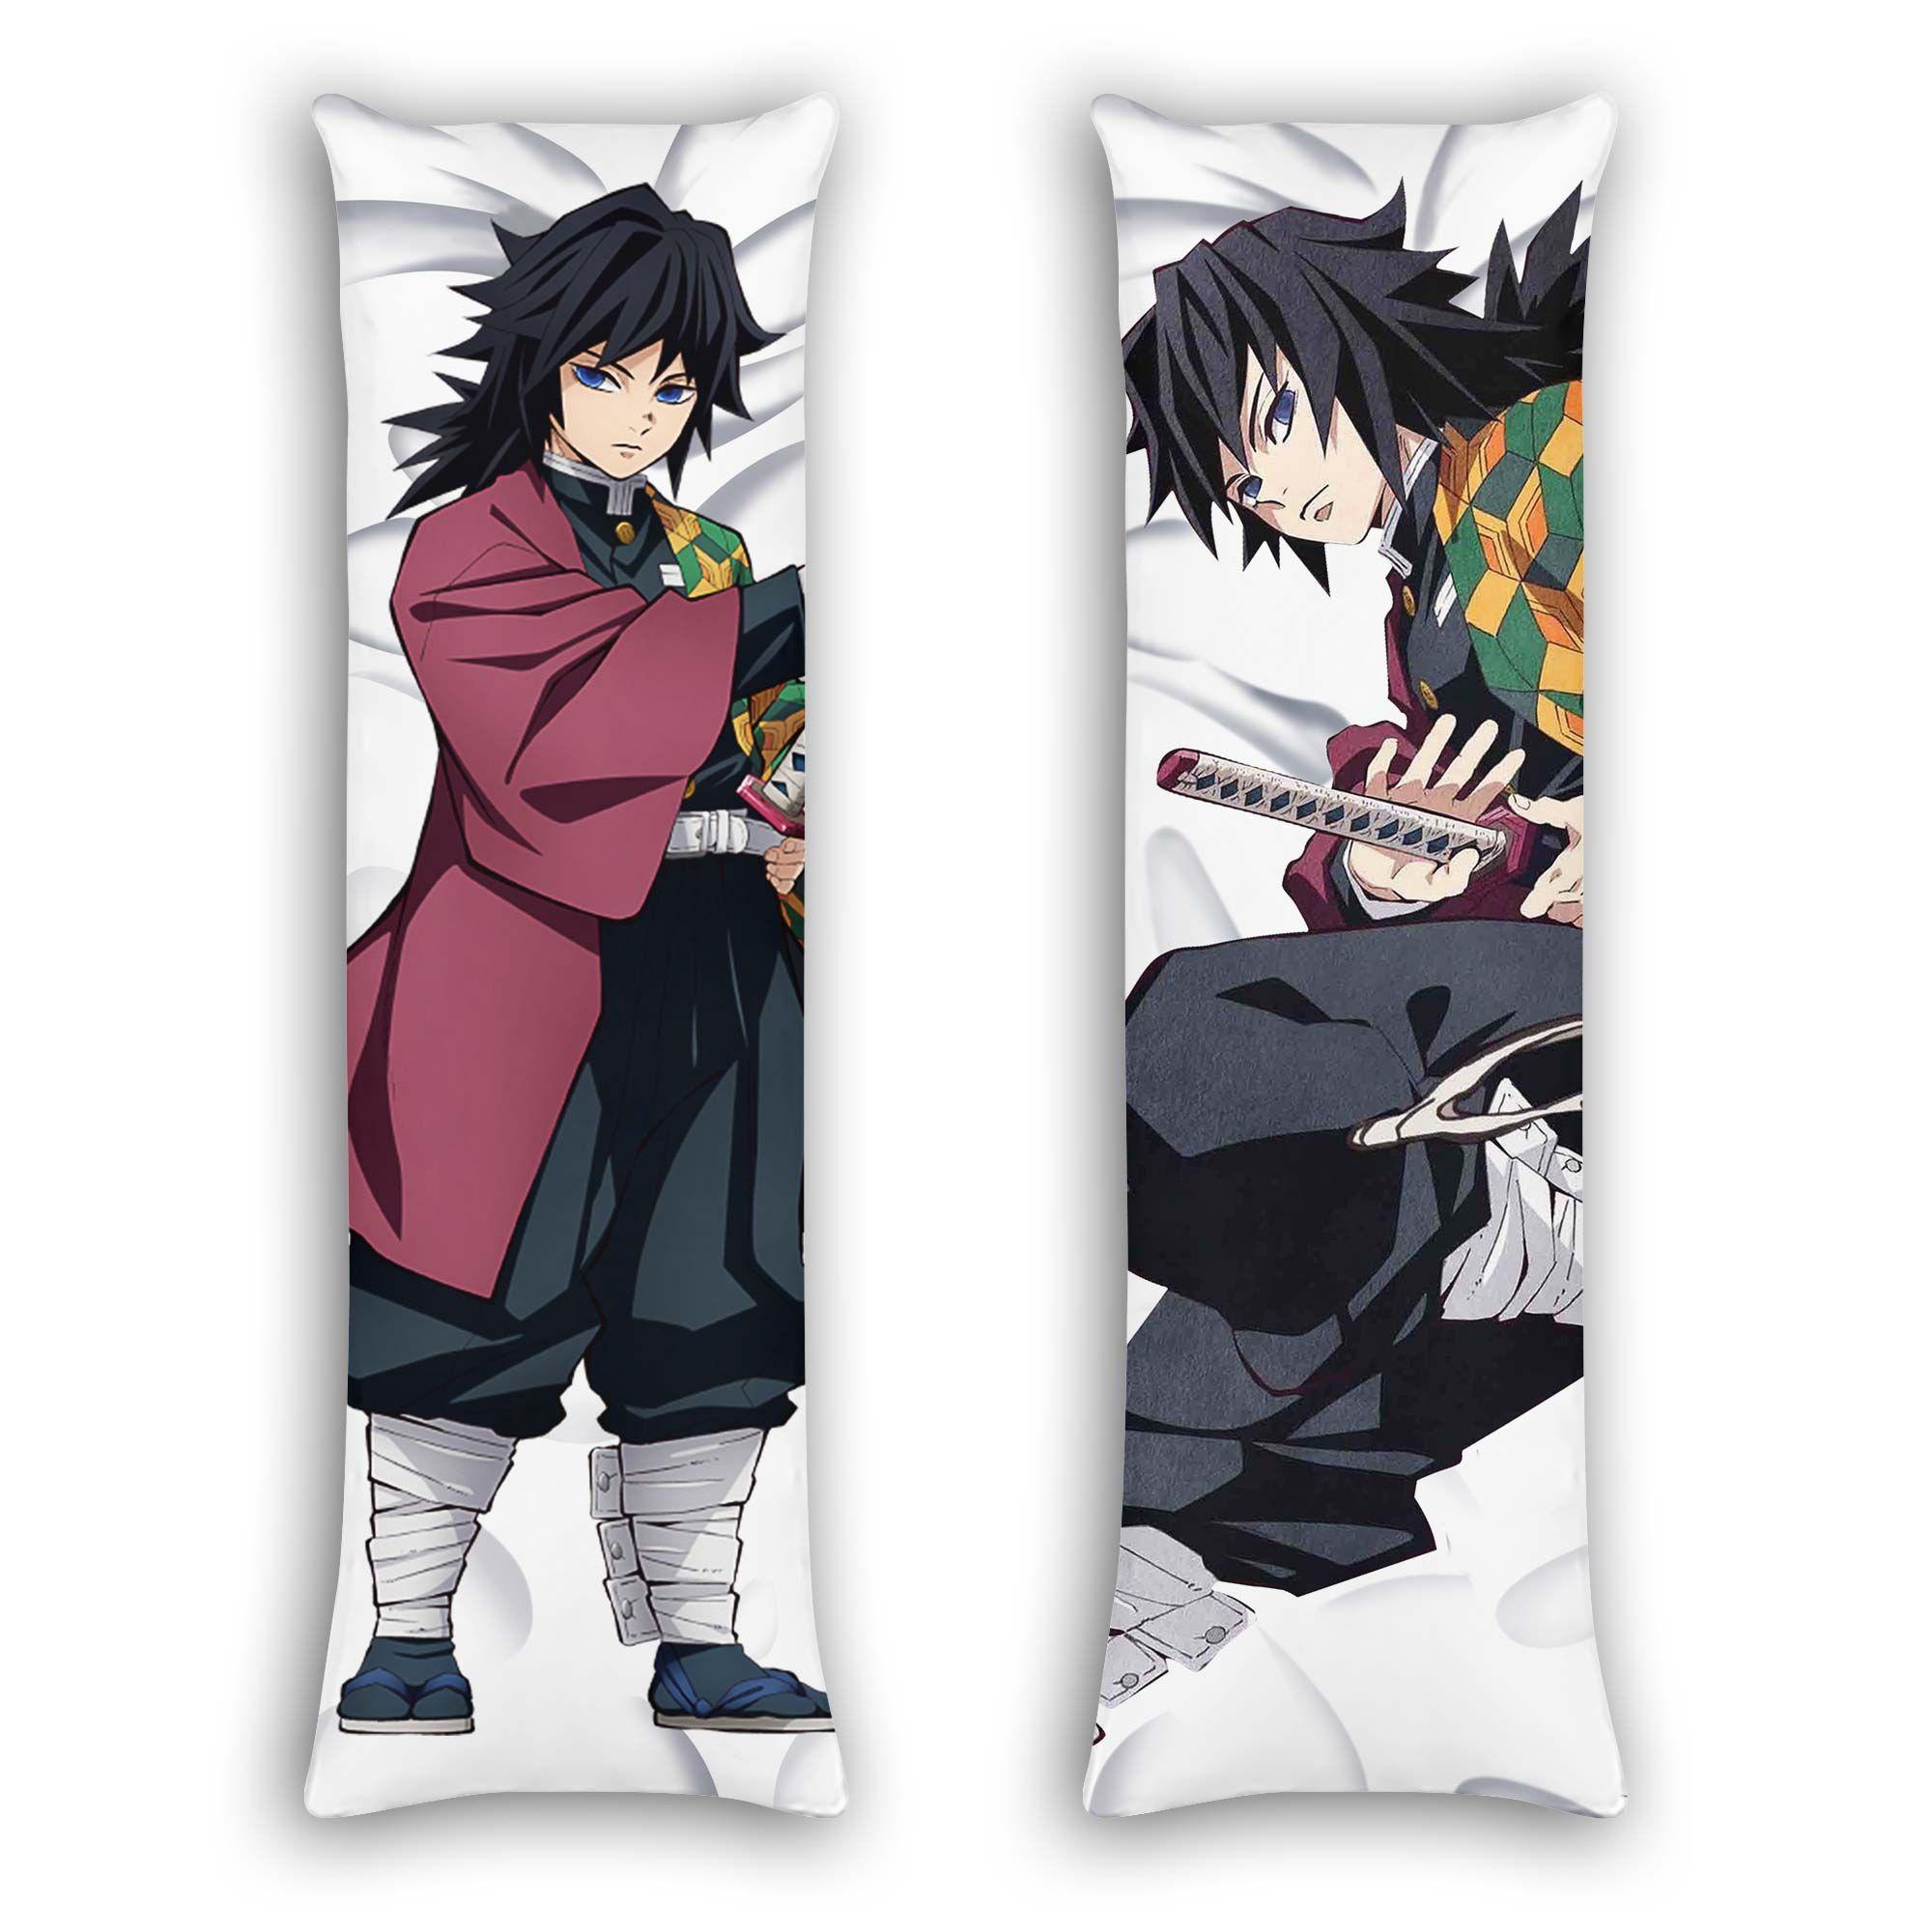 Giyuu Tomioka Body Pillow Cover Custom Demon Slayer Anime Gifts Official Merch GO0110